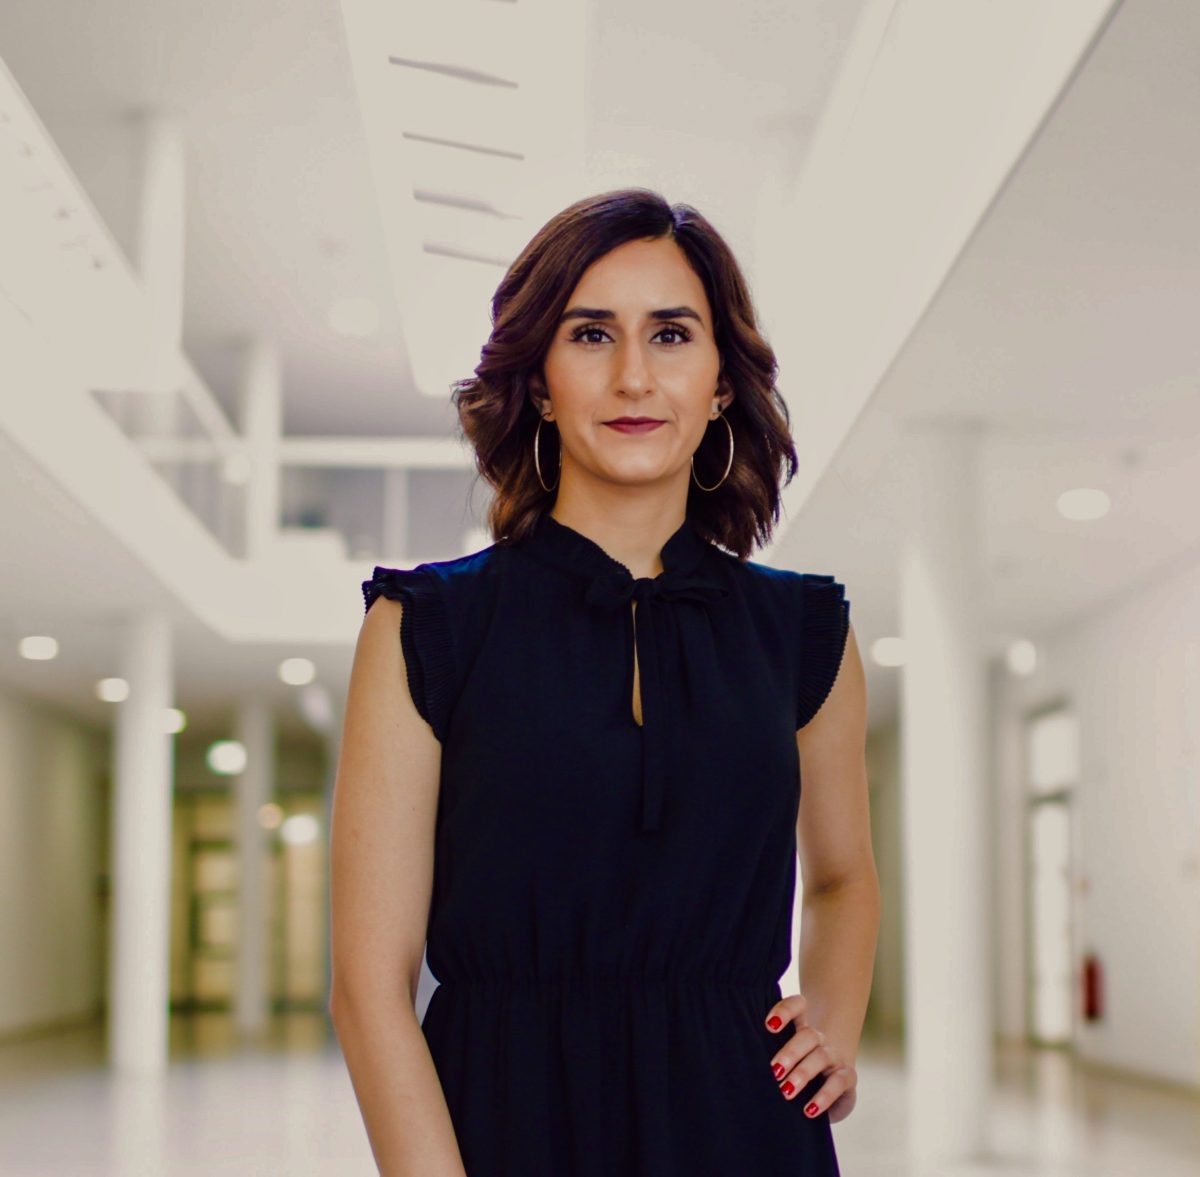 Aylin Karabulut, Foto: André Hirtz